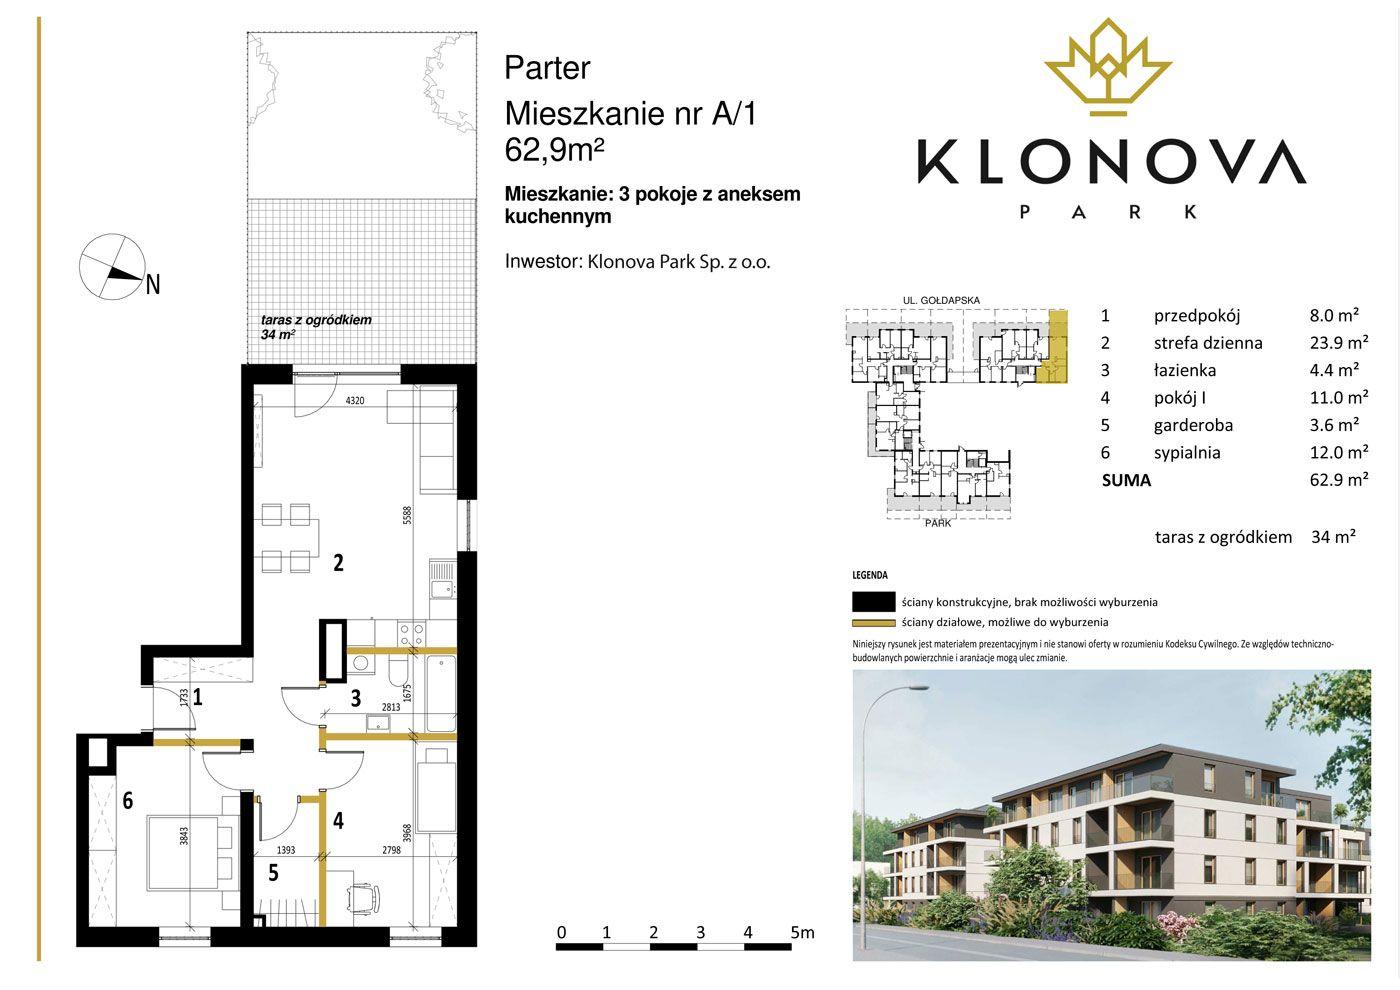 Apartamenty Klonova Park - Plan mieszkania A/1